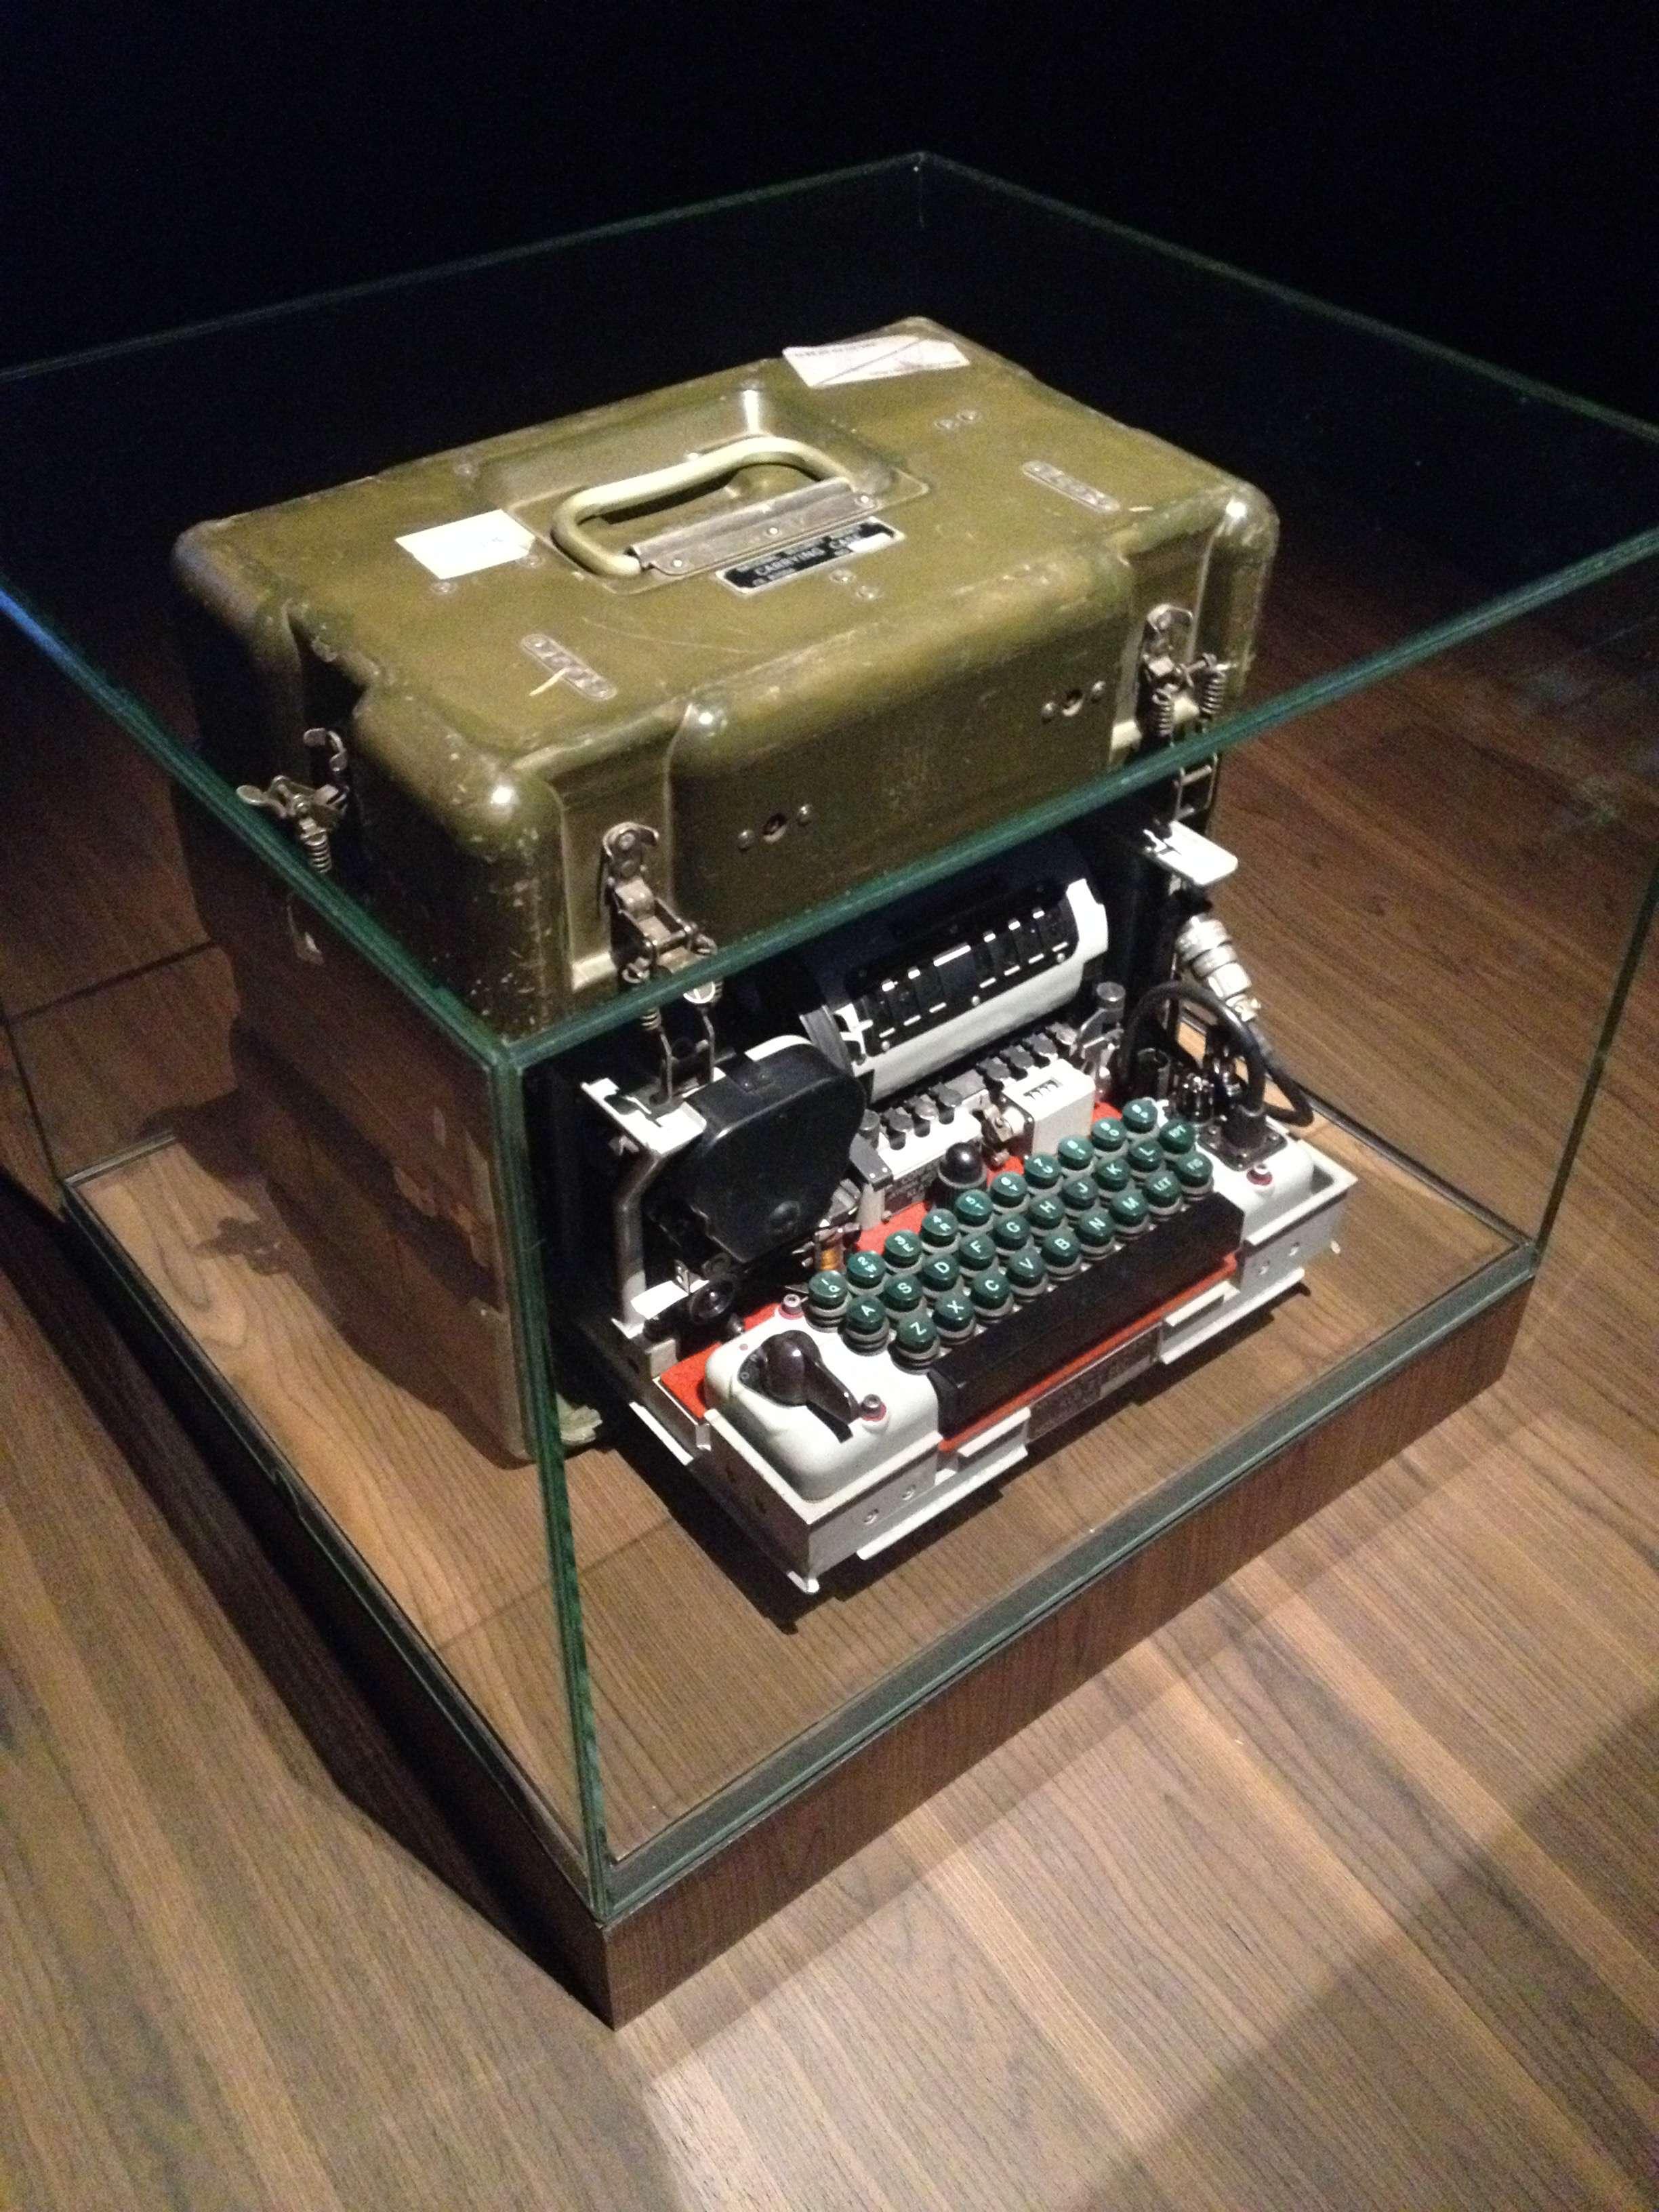 Masinà de codificat mesaje folosità de tàrile NATO între 1950 si 1980